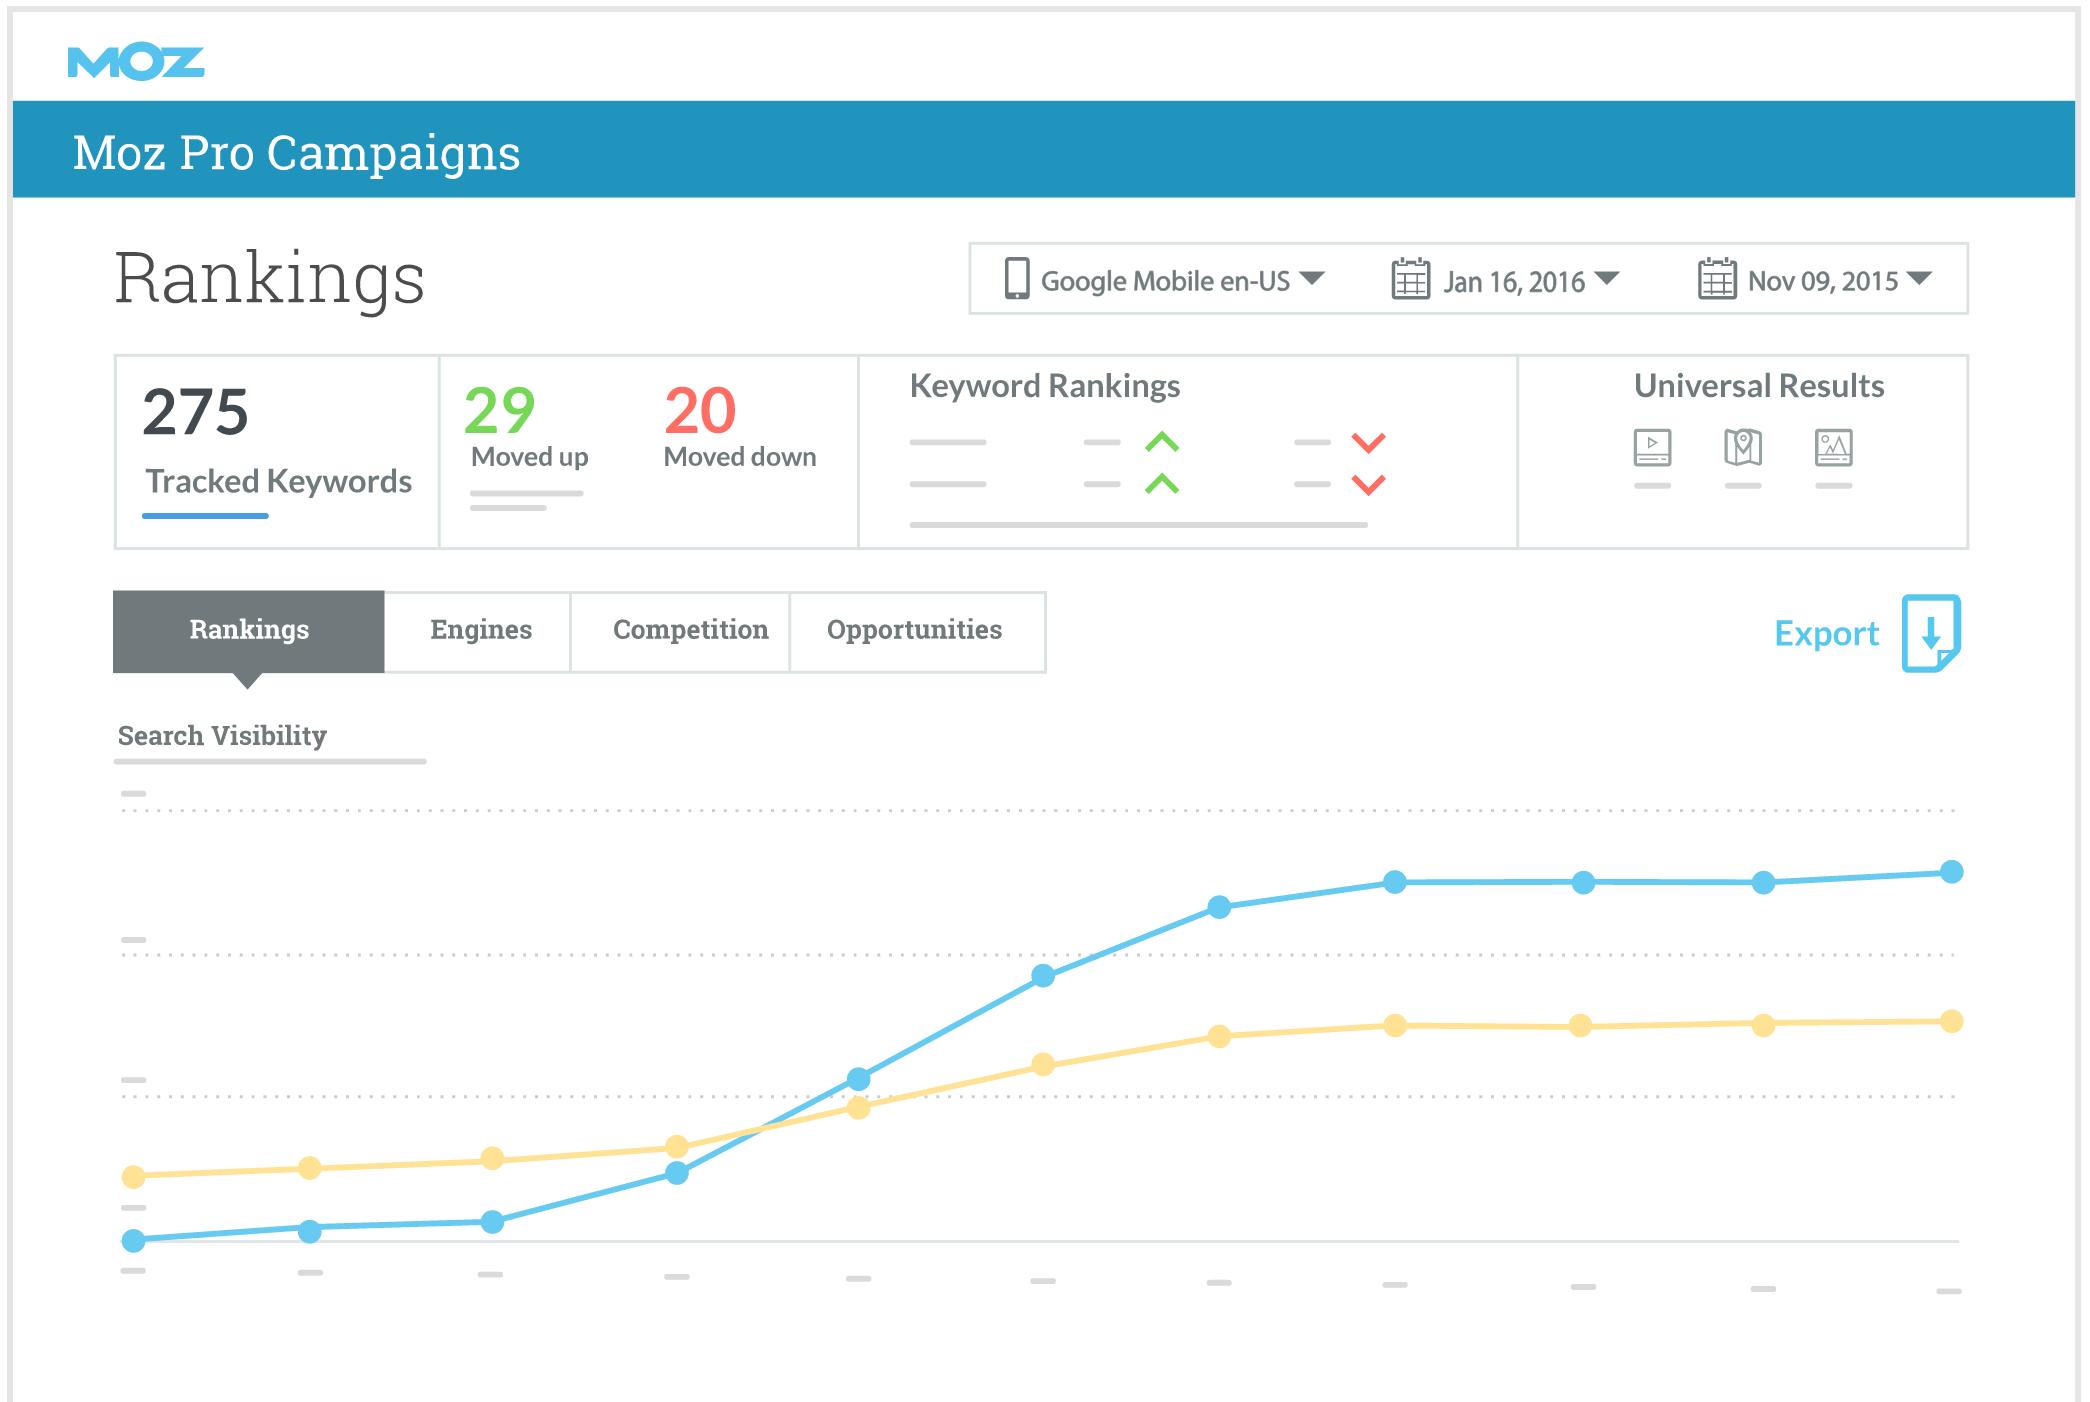 SEO Tools Software Comparison - Moz Pro